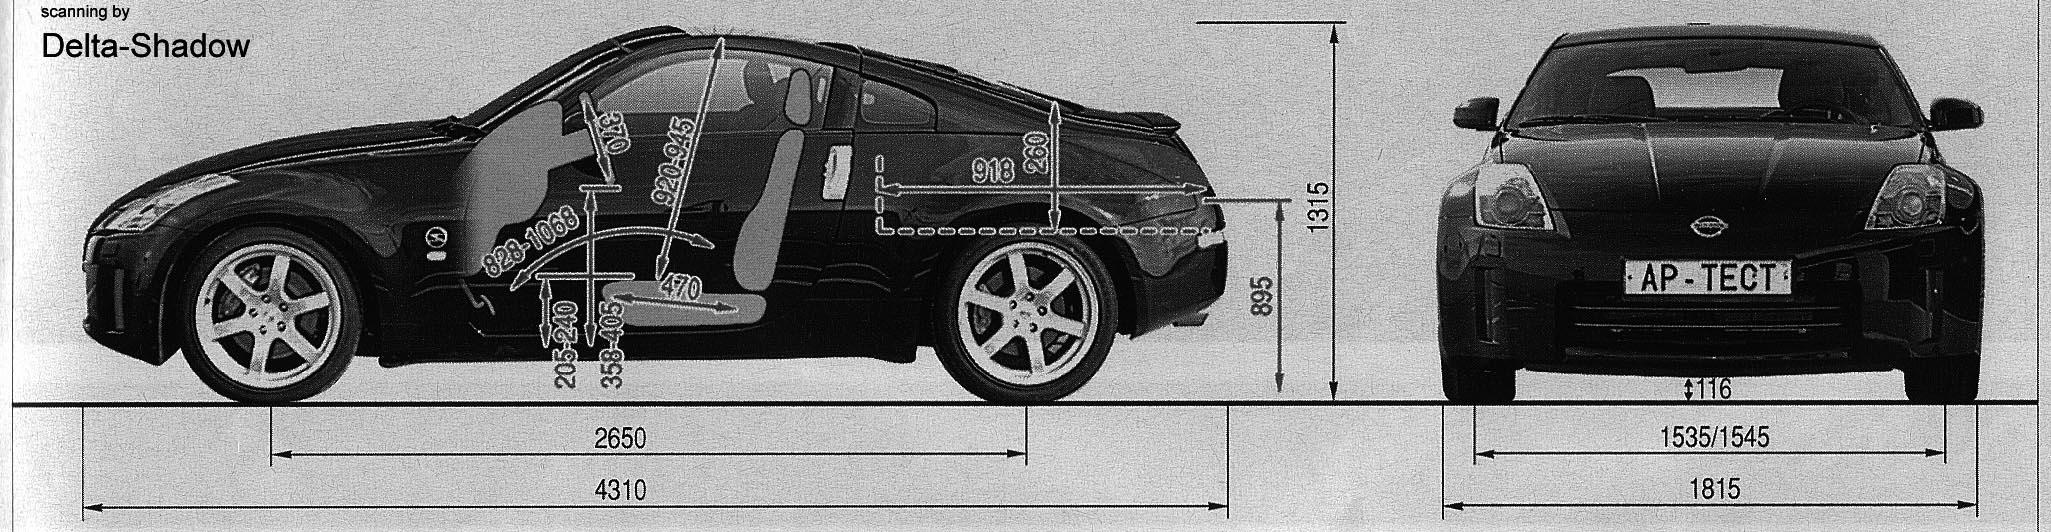 Nissan 350 Z blueprints